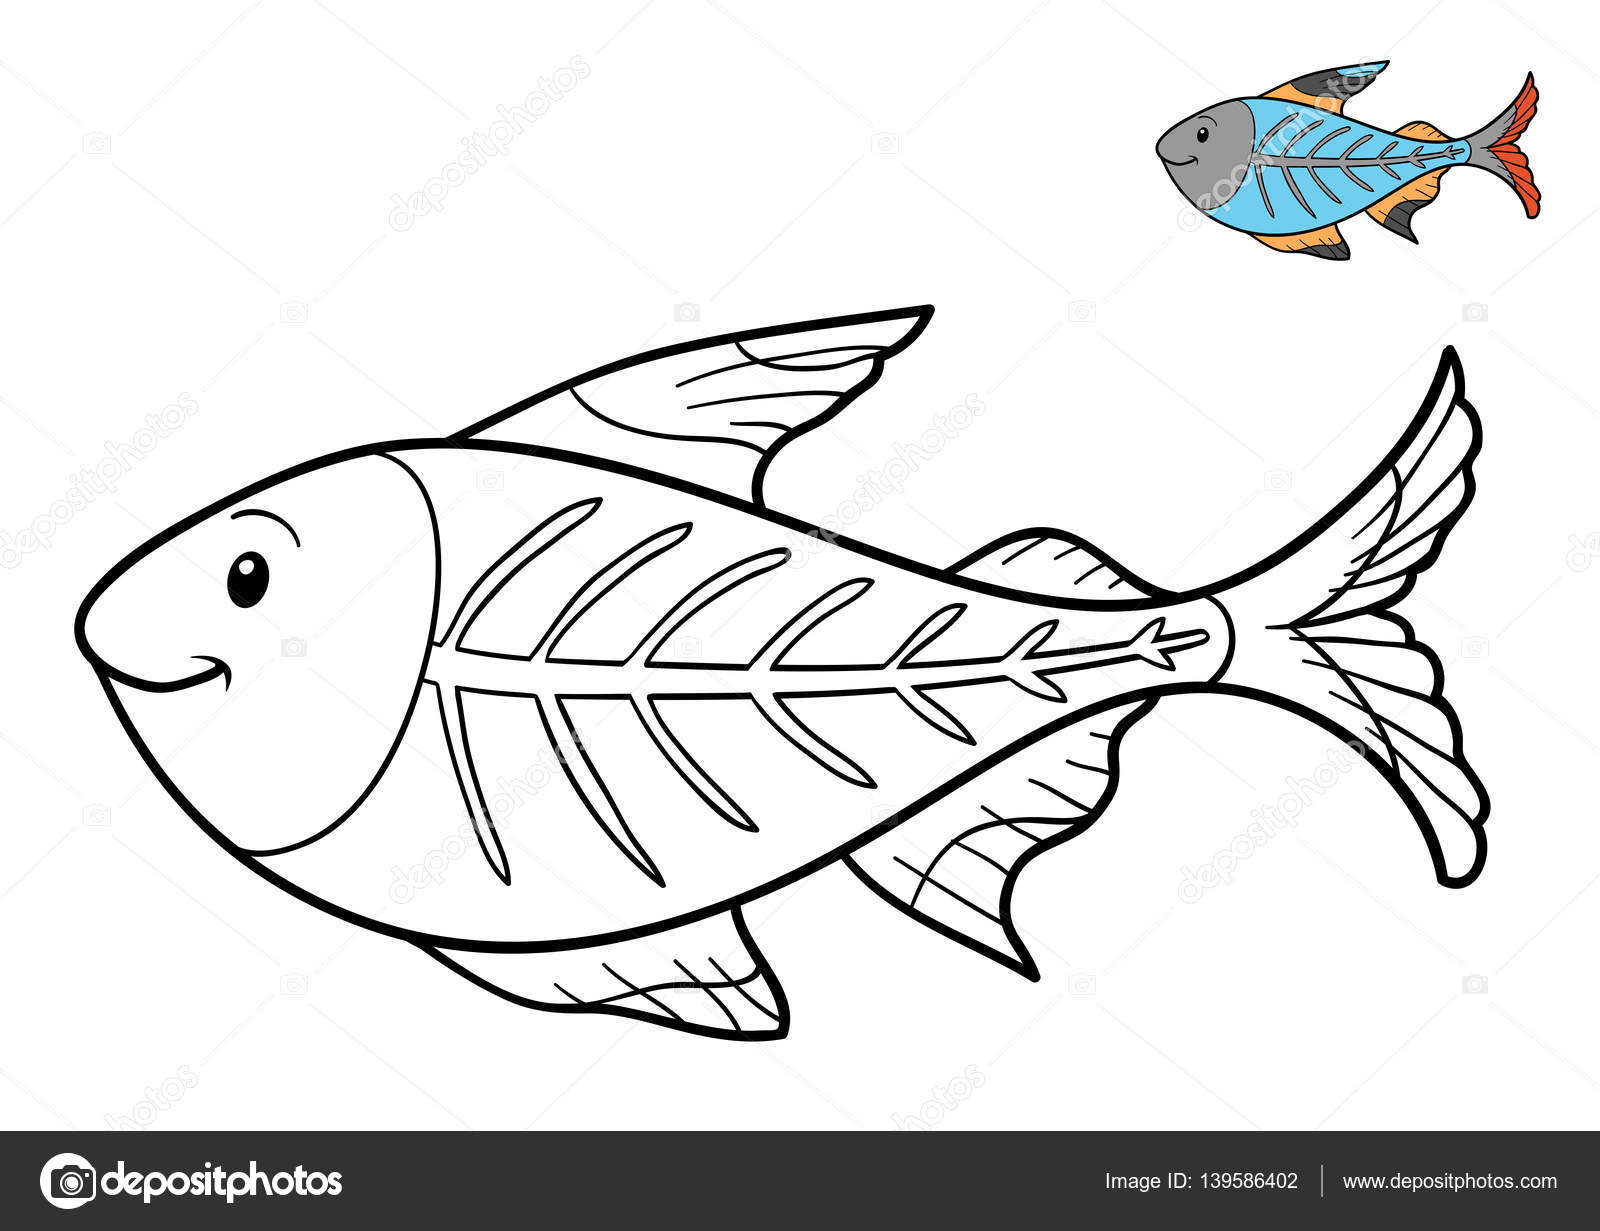 Libro para colorear, peces de rayos x — Fotos de Stock ...